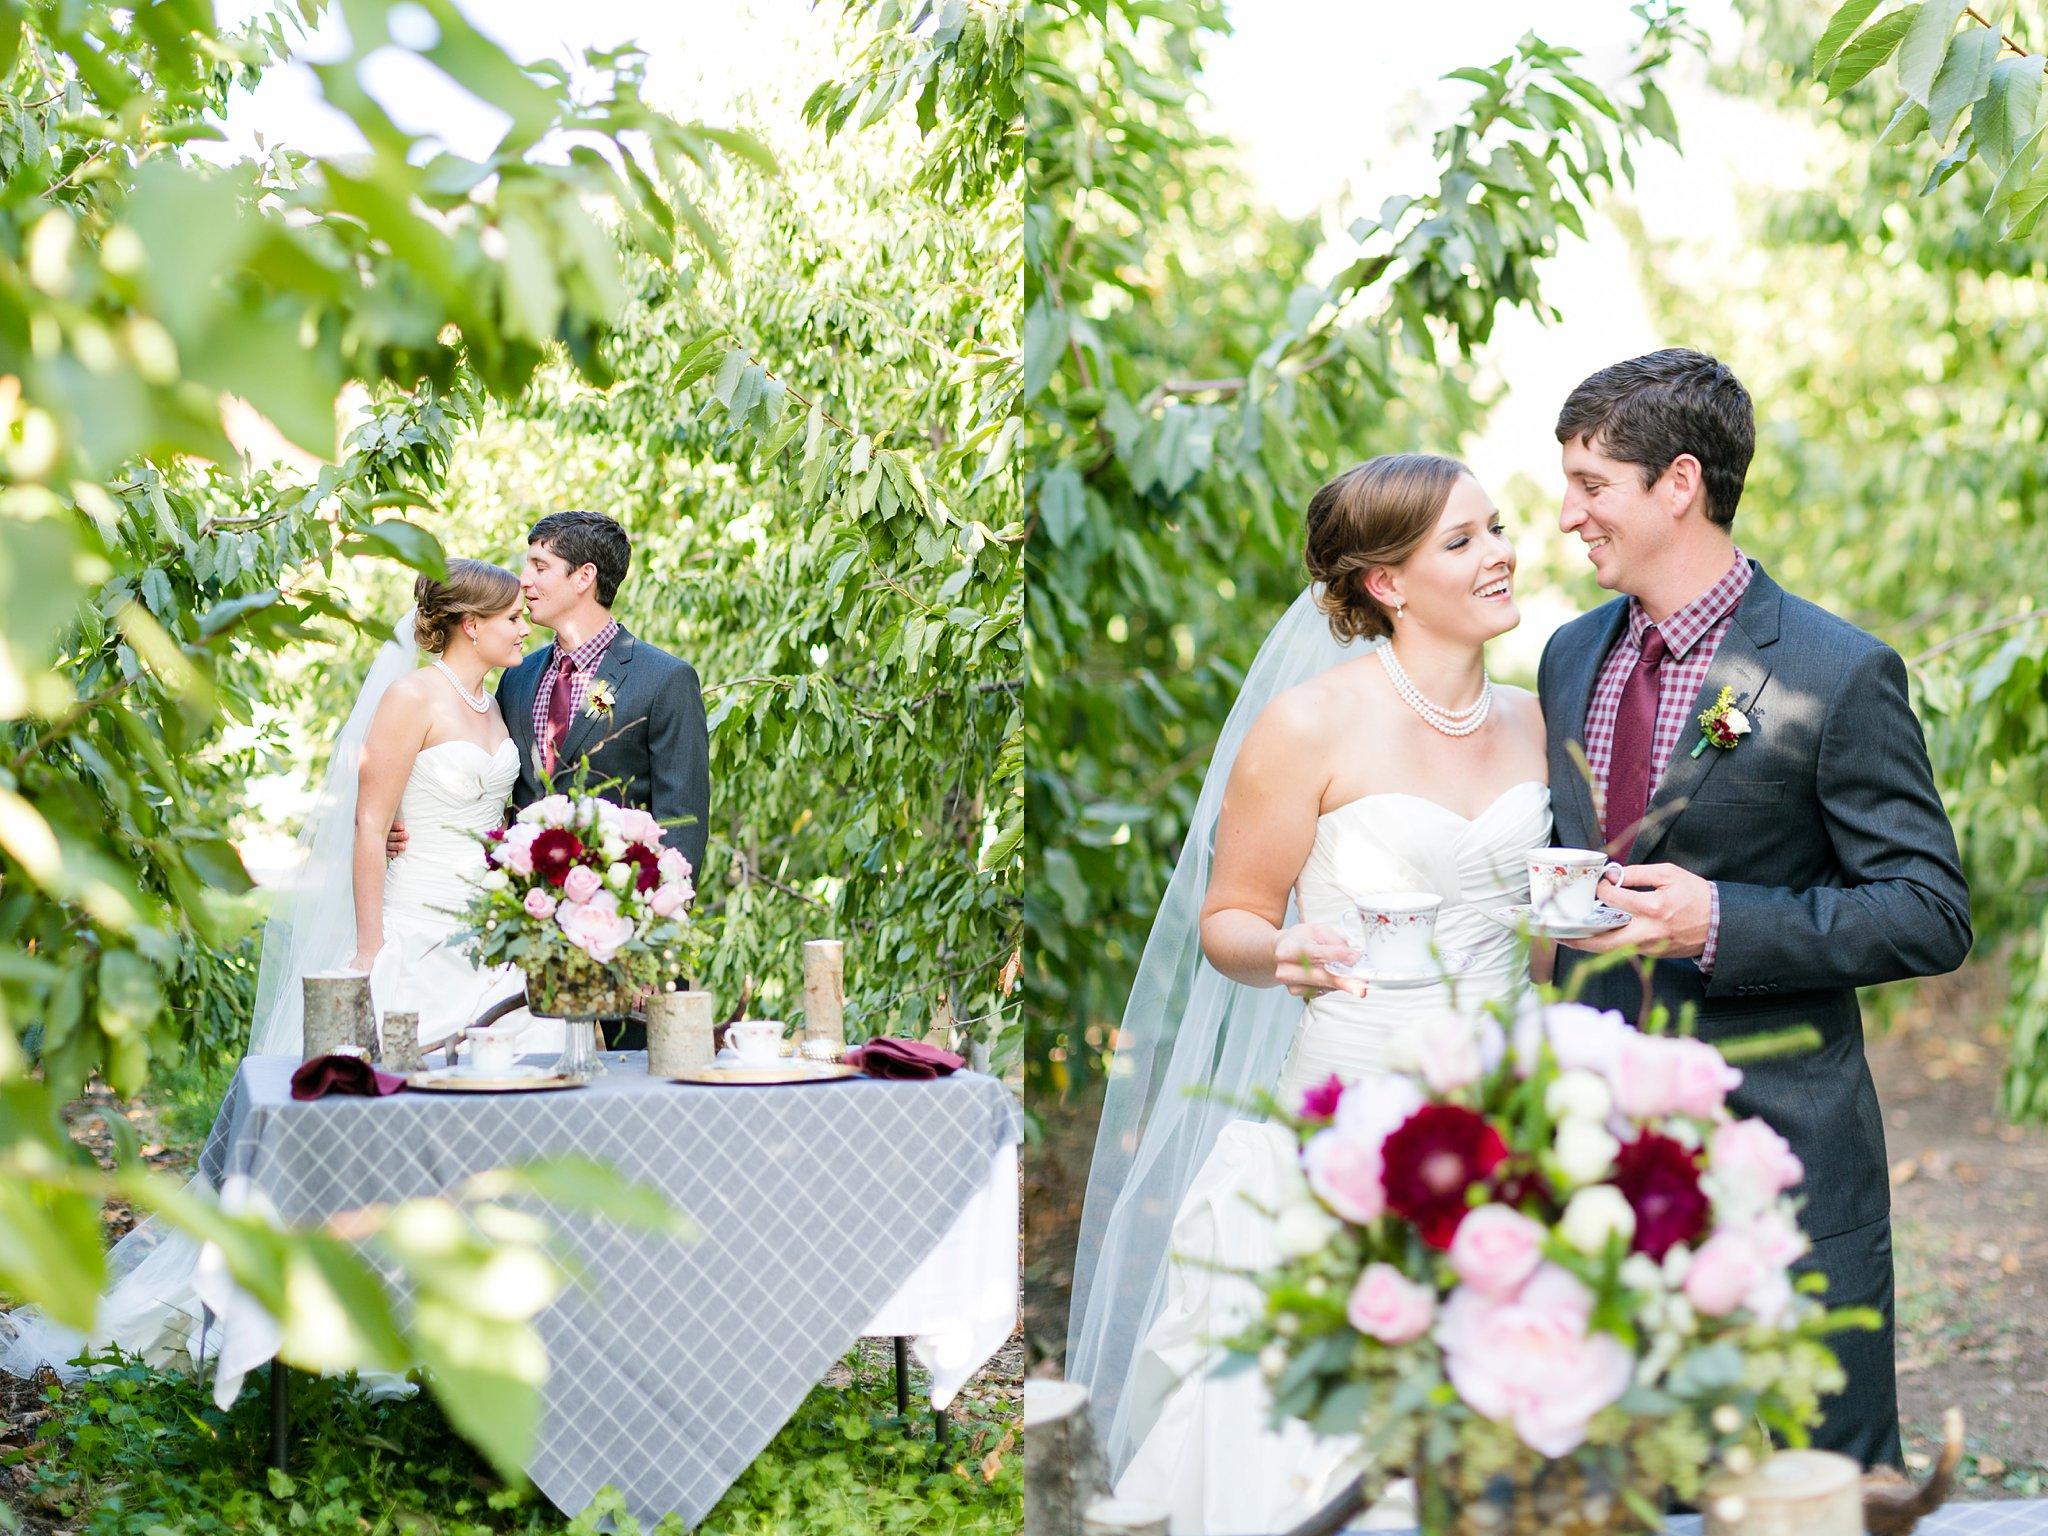 Chelan Washington Wedding Photos Megan Kelsey Photography Delight Wedding Workshop Styled Shoot Annalee & Scot-62.jpg